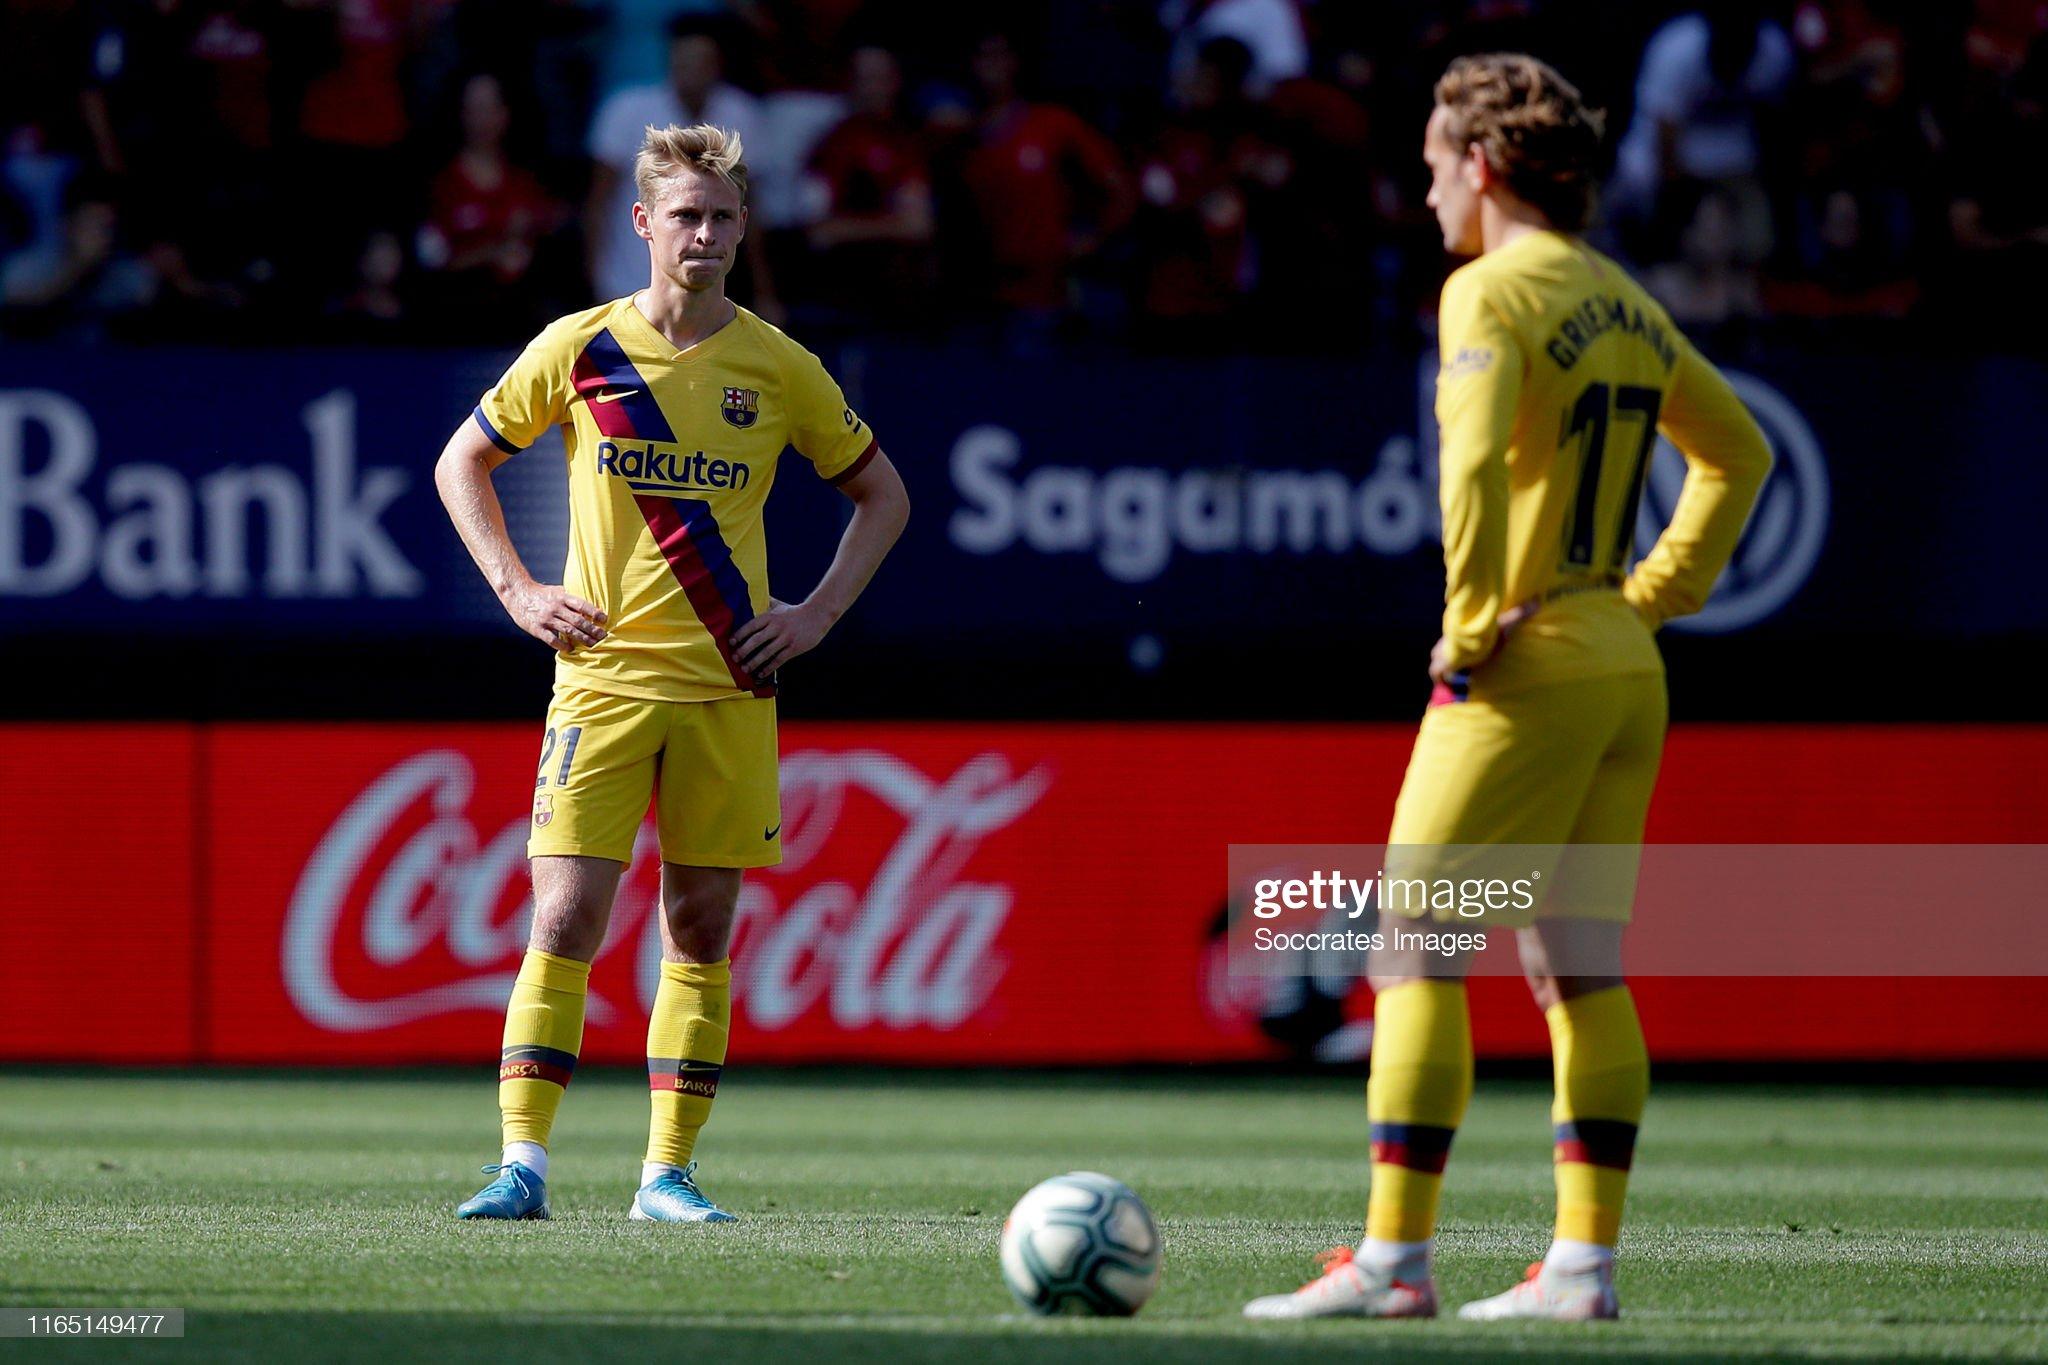 صور مباراة : أوساسونا - برشلونة 2-2 ( 31-08-2019 )  Frenkie-de-jong-of-fc-barcelona-during-the-la-liga-santander-match-picture-id1165149477?s=2048x2048